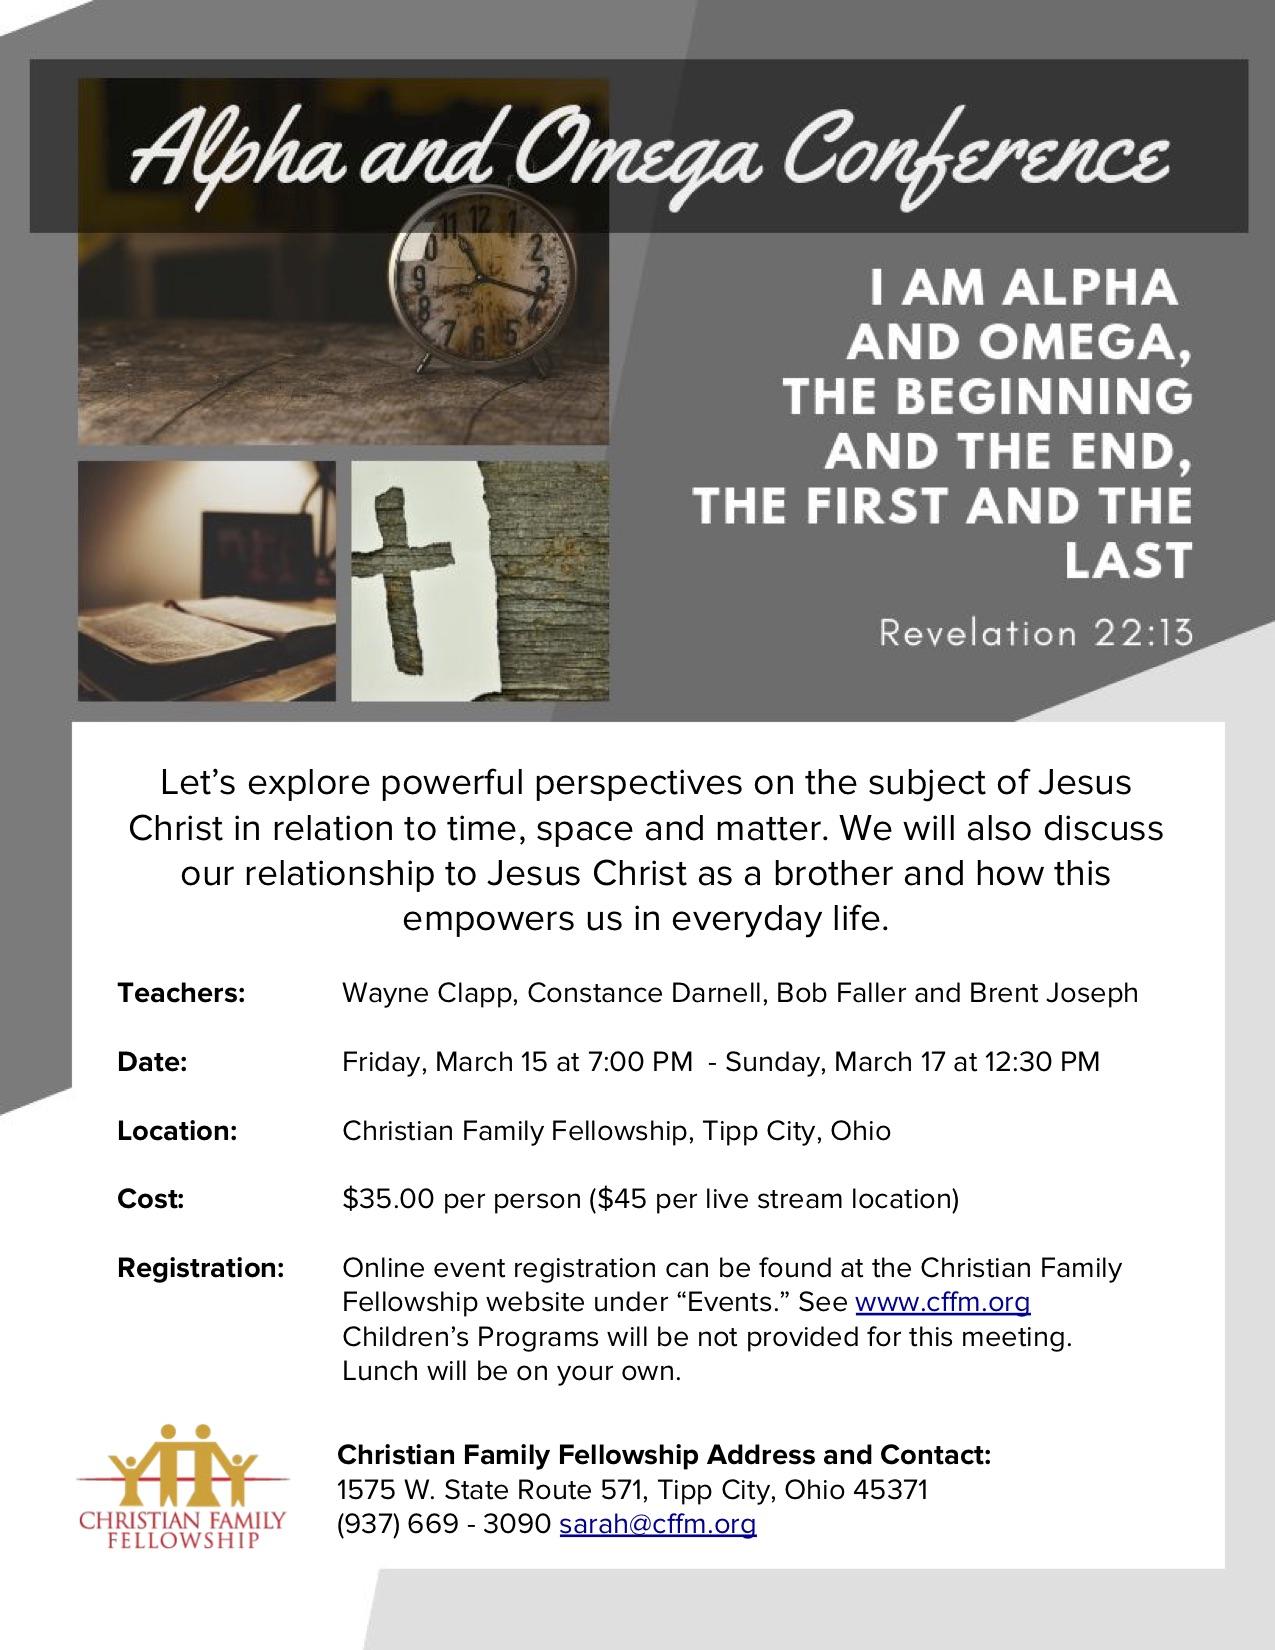 Alpha and Omega Conference logo